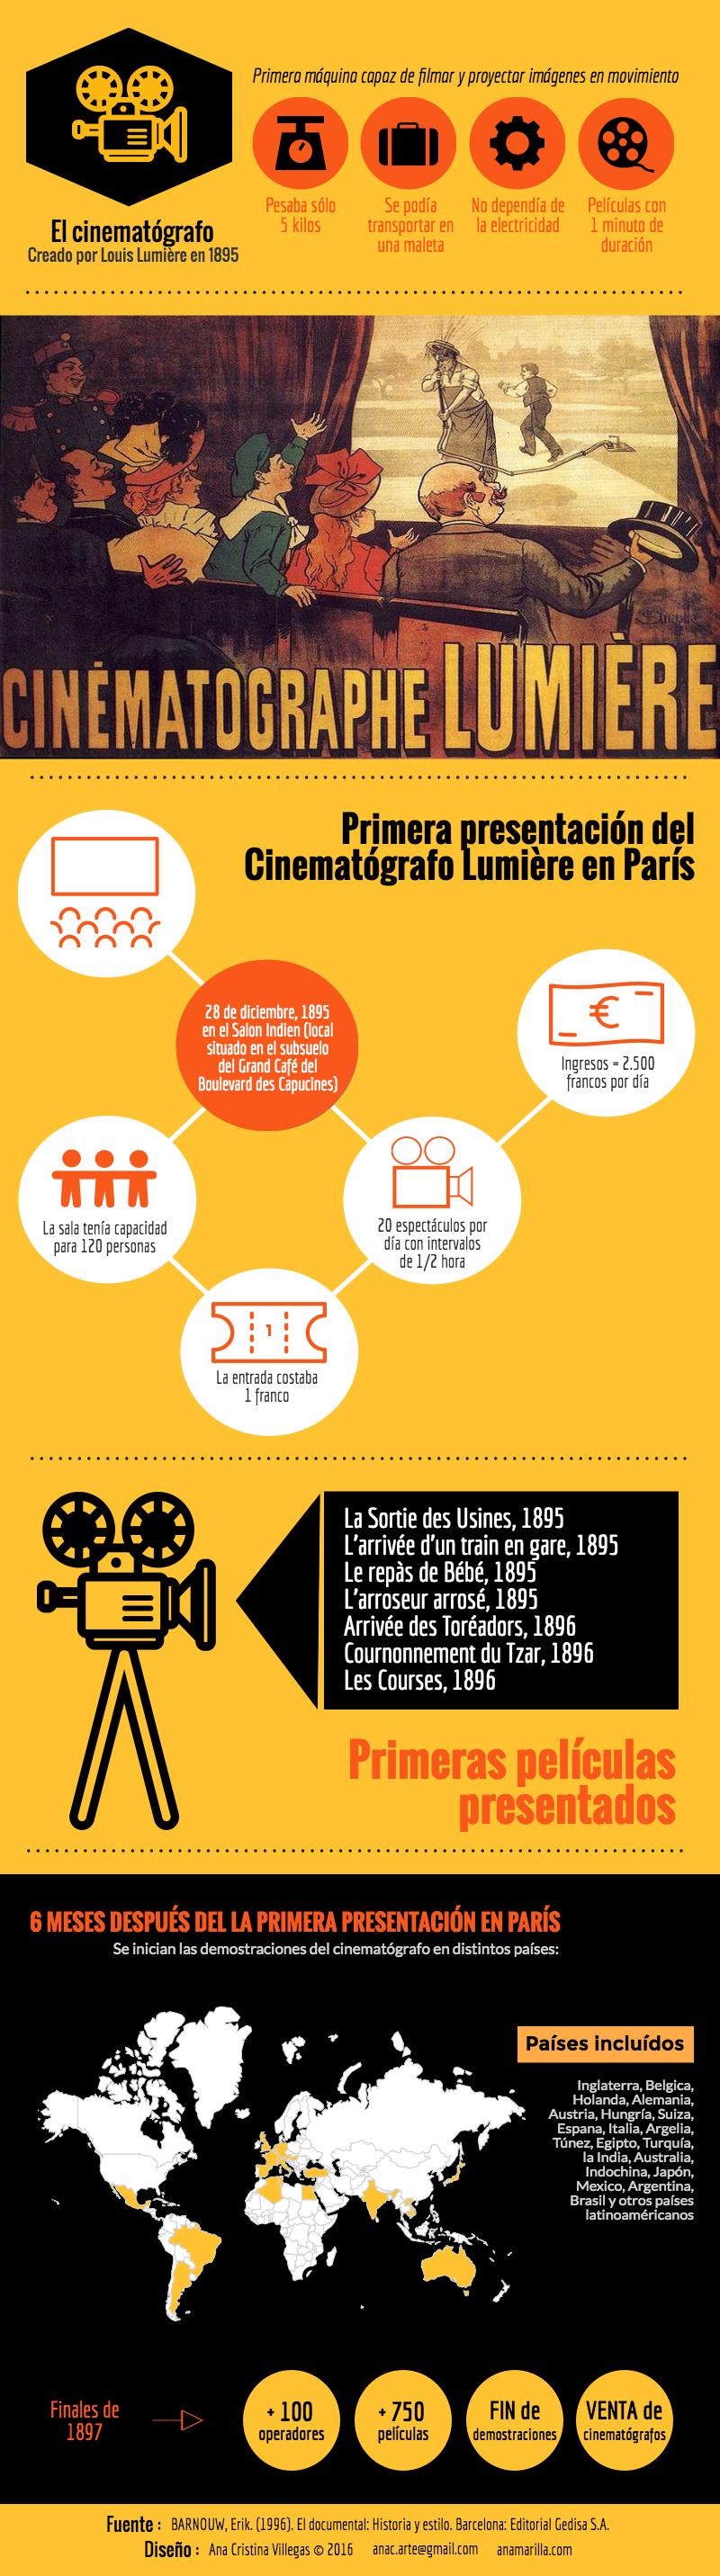 infografia-cinematografolumiere